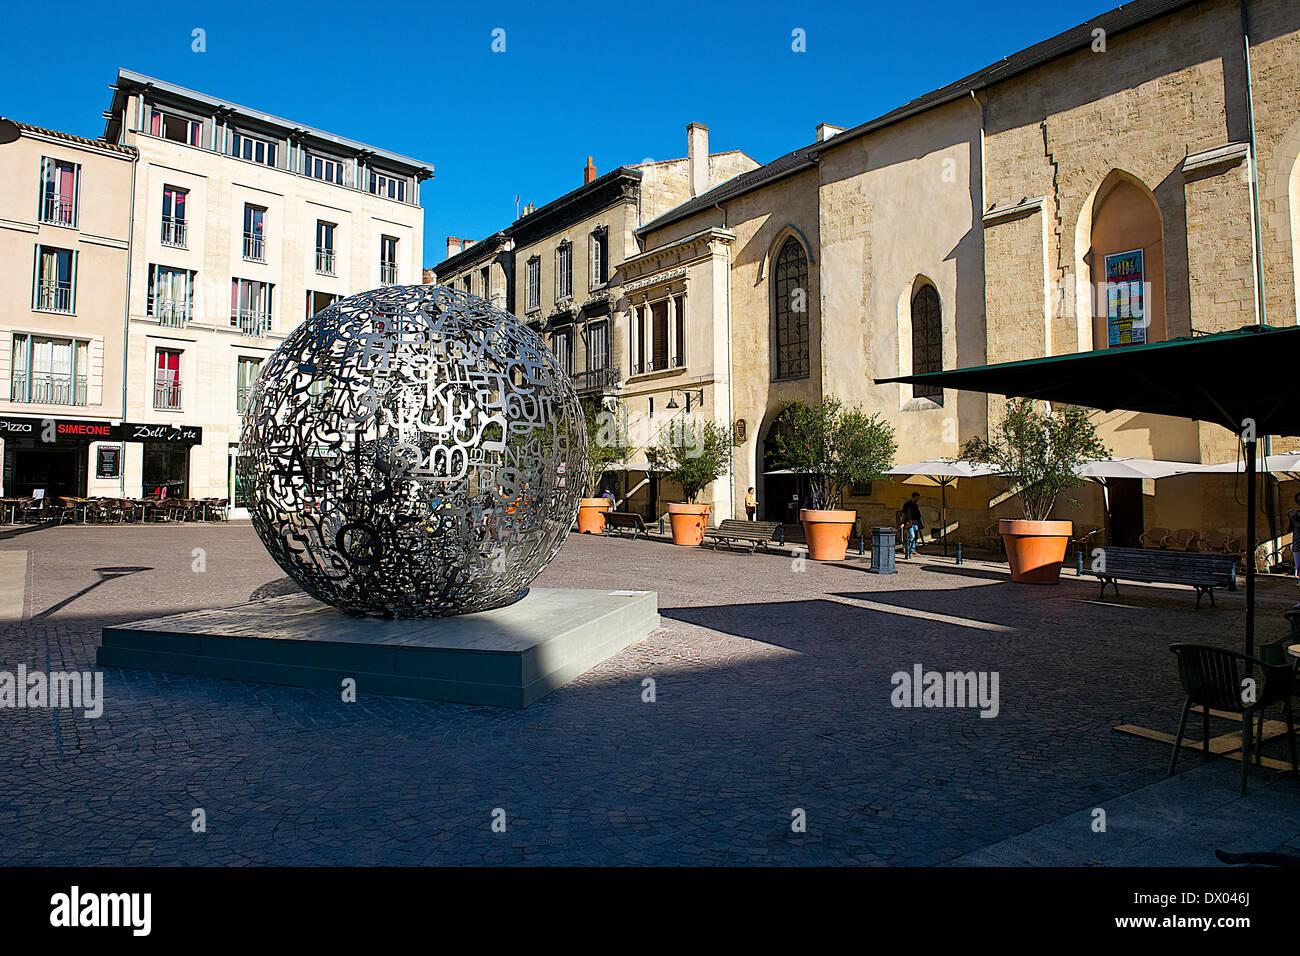 Artistic sphere in Bordeaux, France - Stock Image